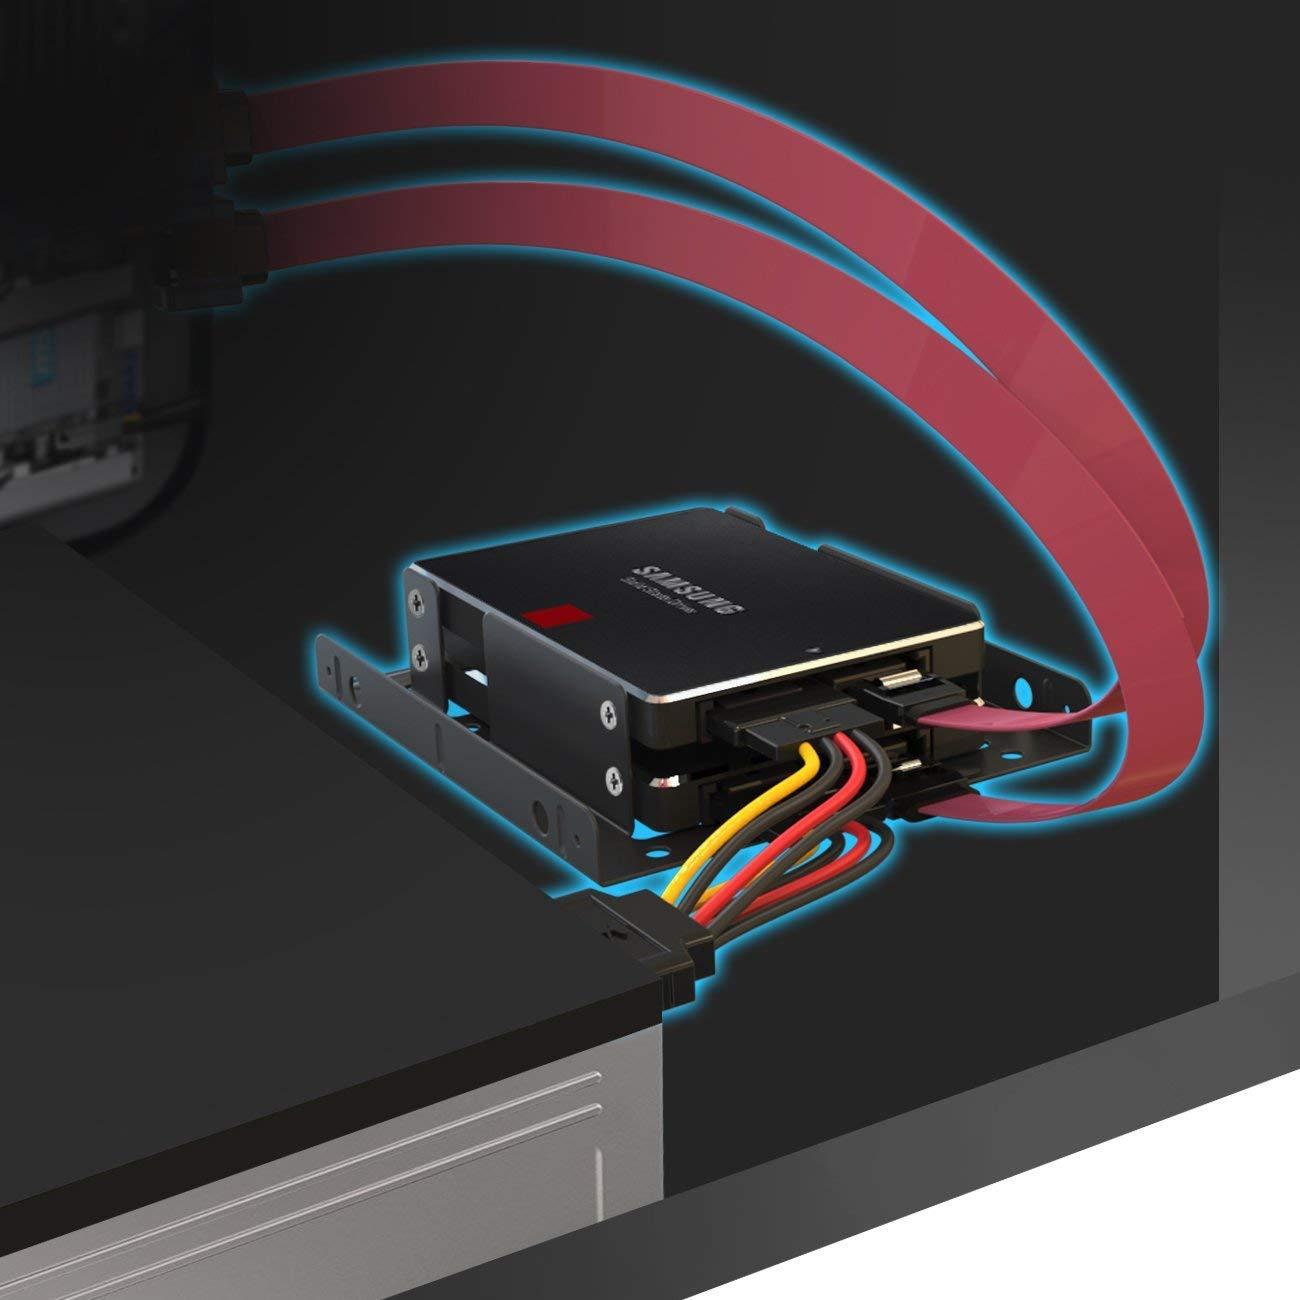 1x 4 Pin a 2X 15 Pin, 1x 15 Pin a 2X 15 Pin Inateck SSD//SATA III Cables 2X SATA Cables de Datos 48 cm y 2X Cables de alimentaciones 16 cm